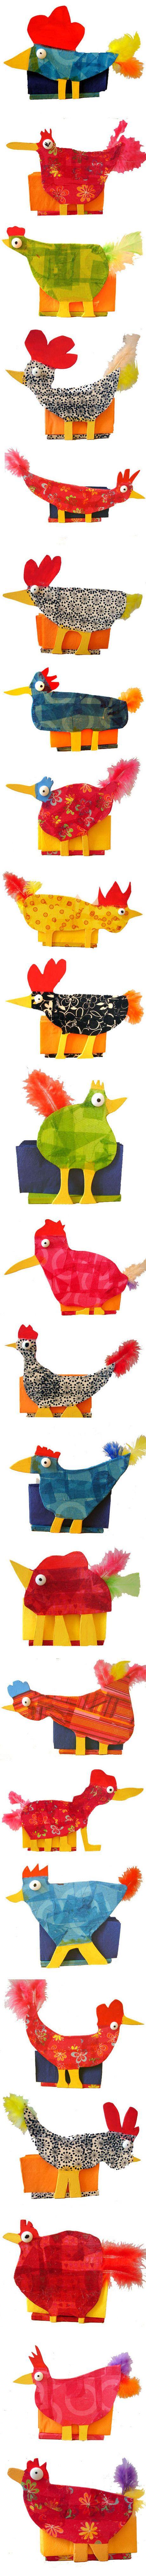 Hens - serviettenhouder